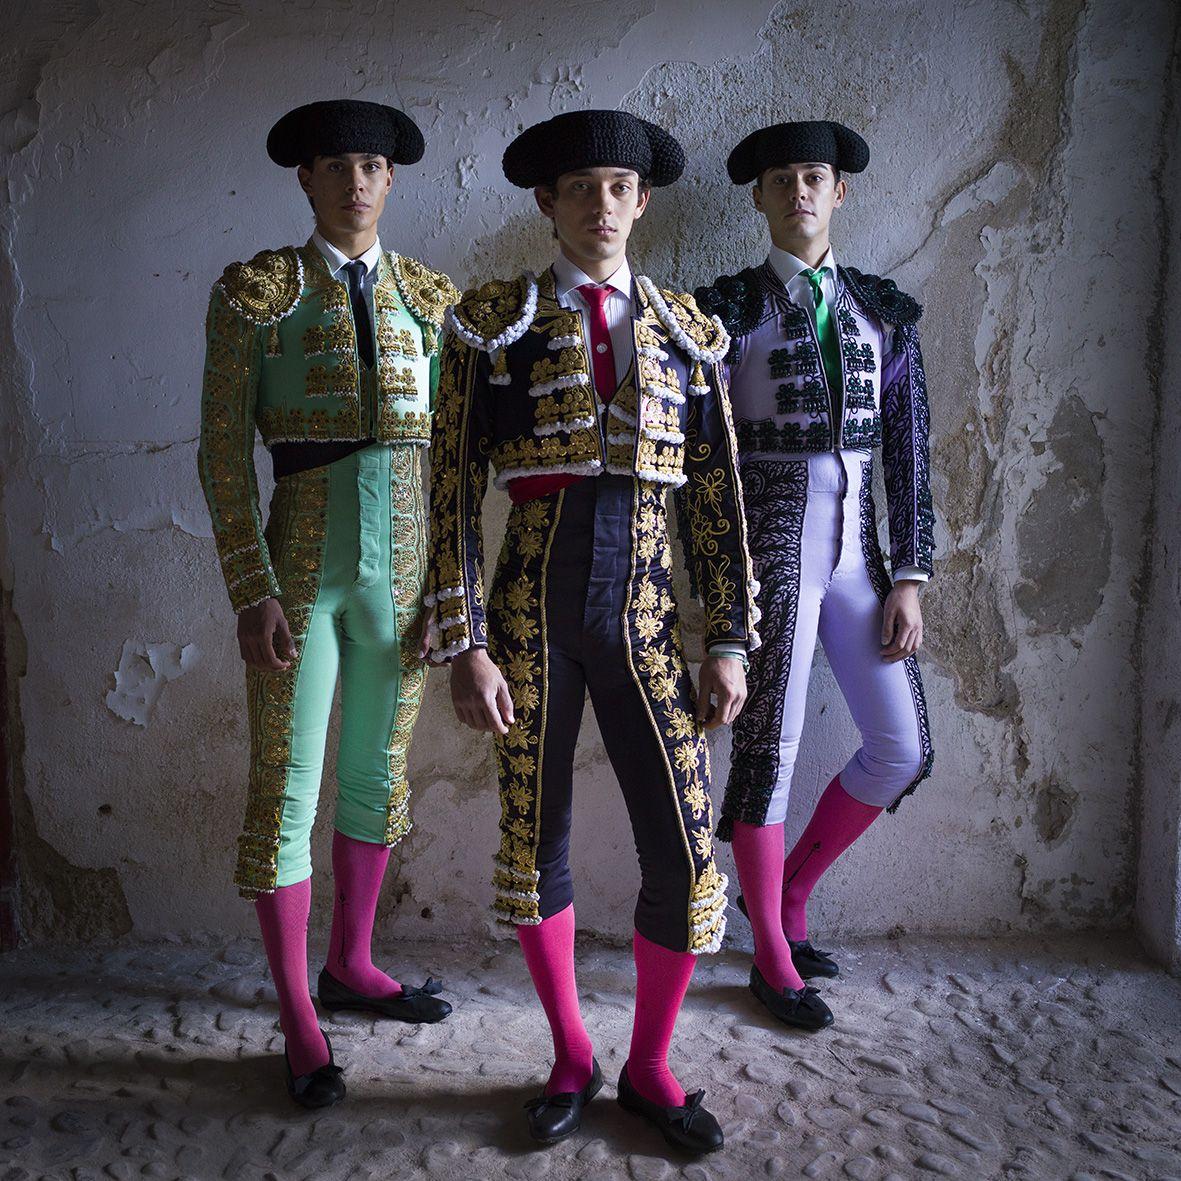 MICHAL CHELBIN, Alvaro, Christian and Francisco, Spain, 2018